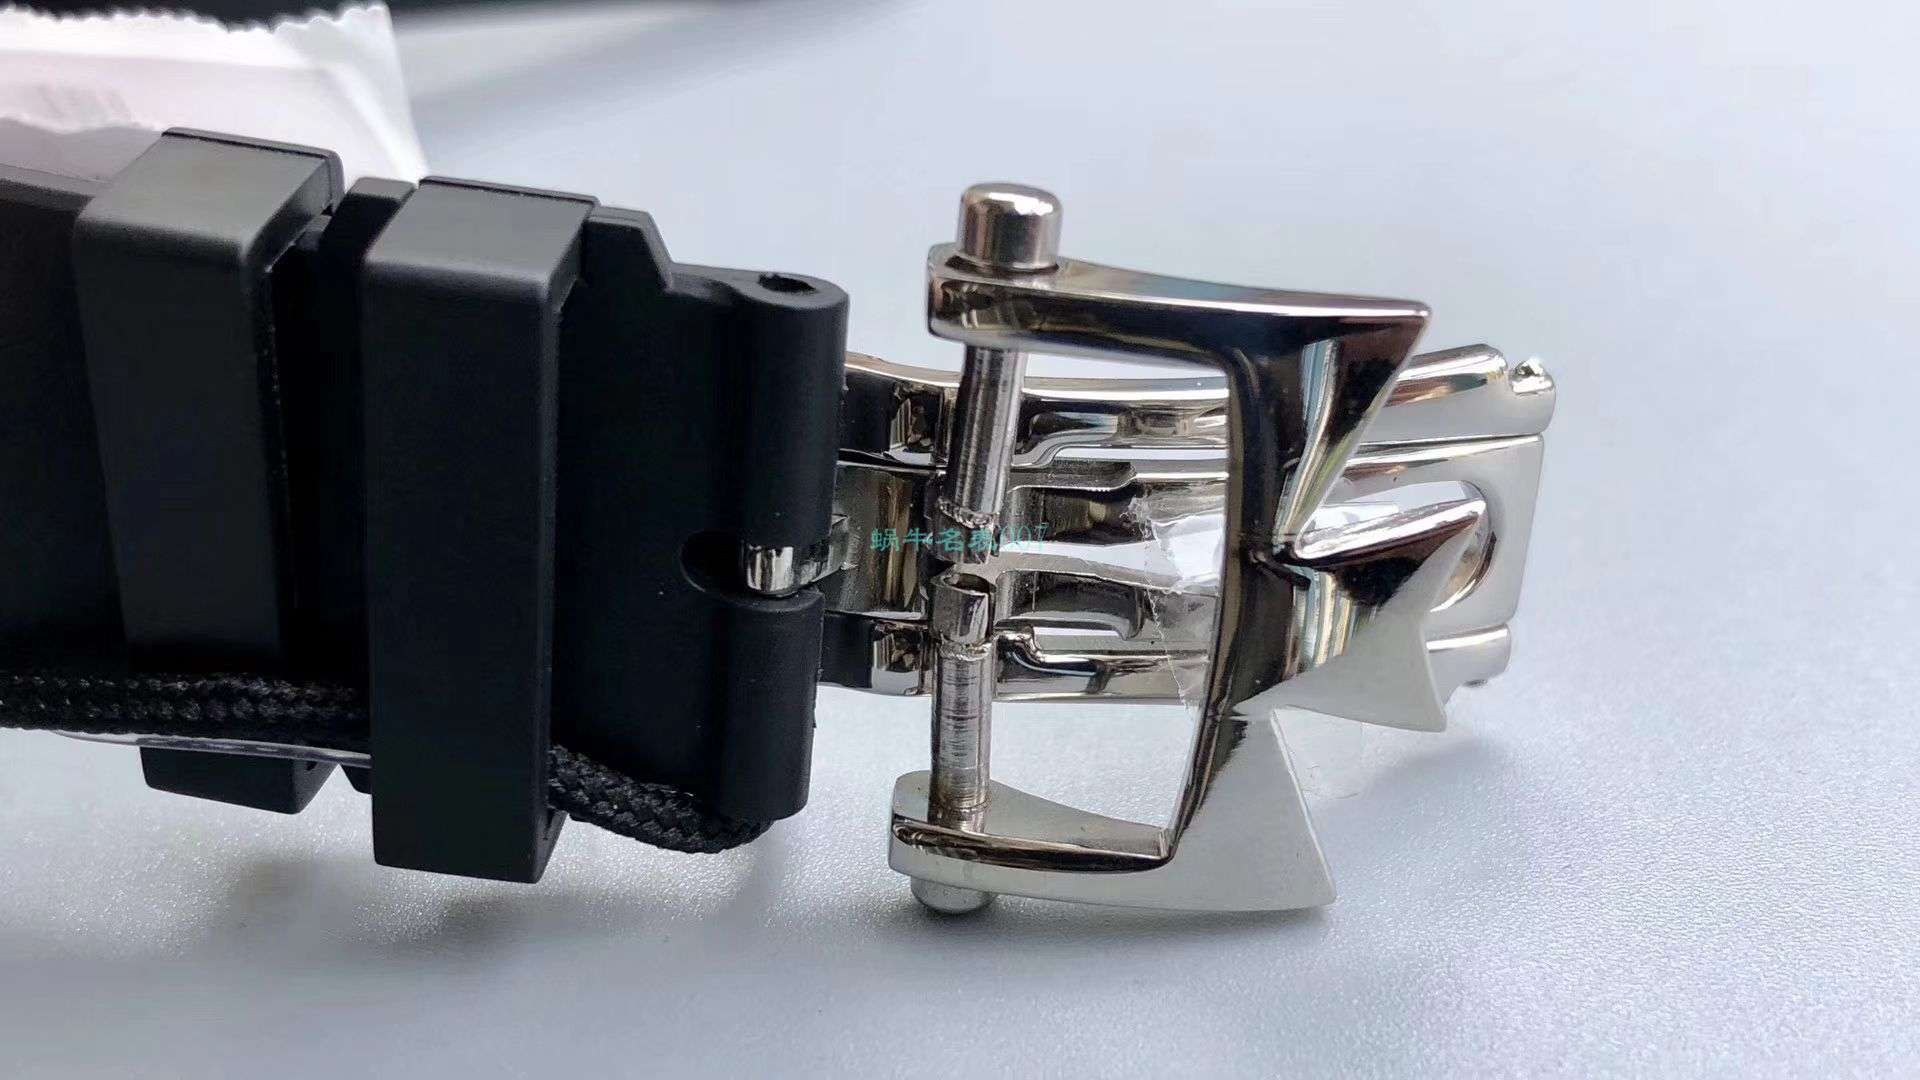 8F厂官网复刻江诗丹顿纵横四海系列47040/B01A-9093腕表 / JS216